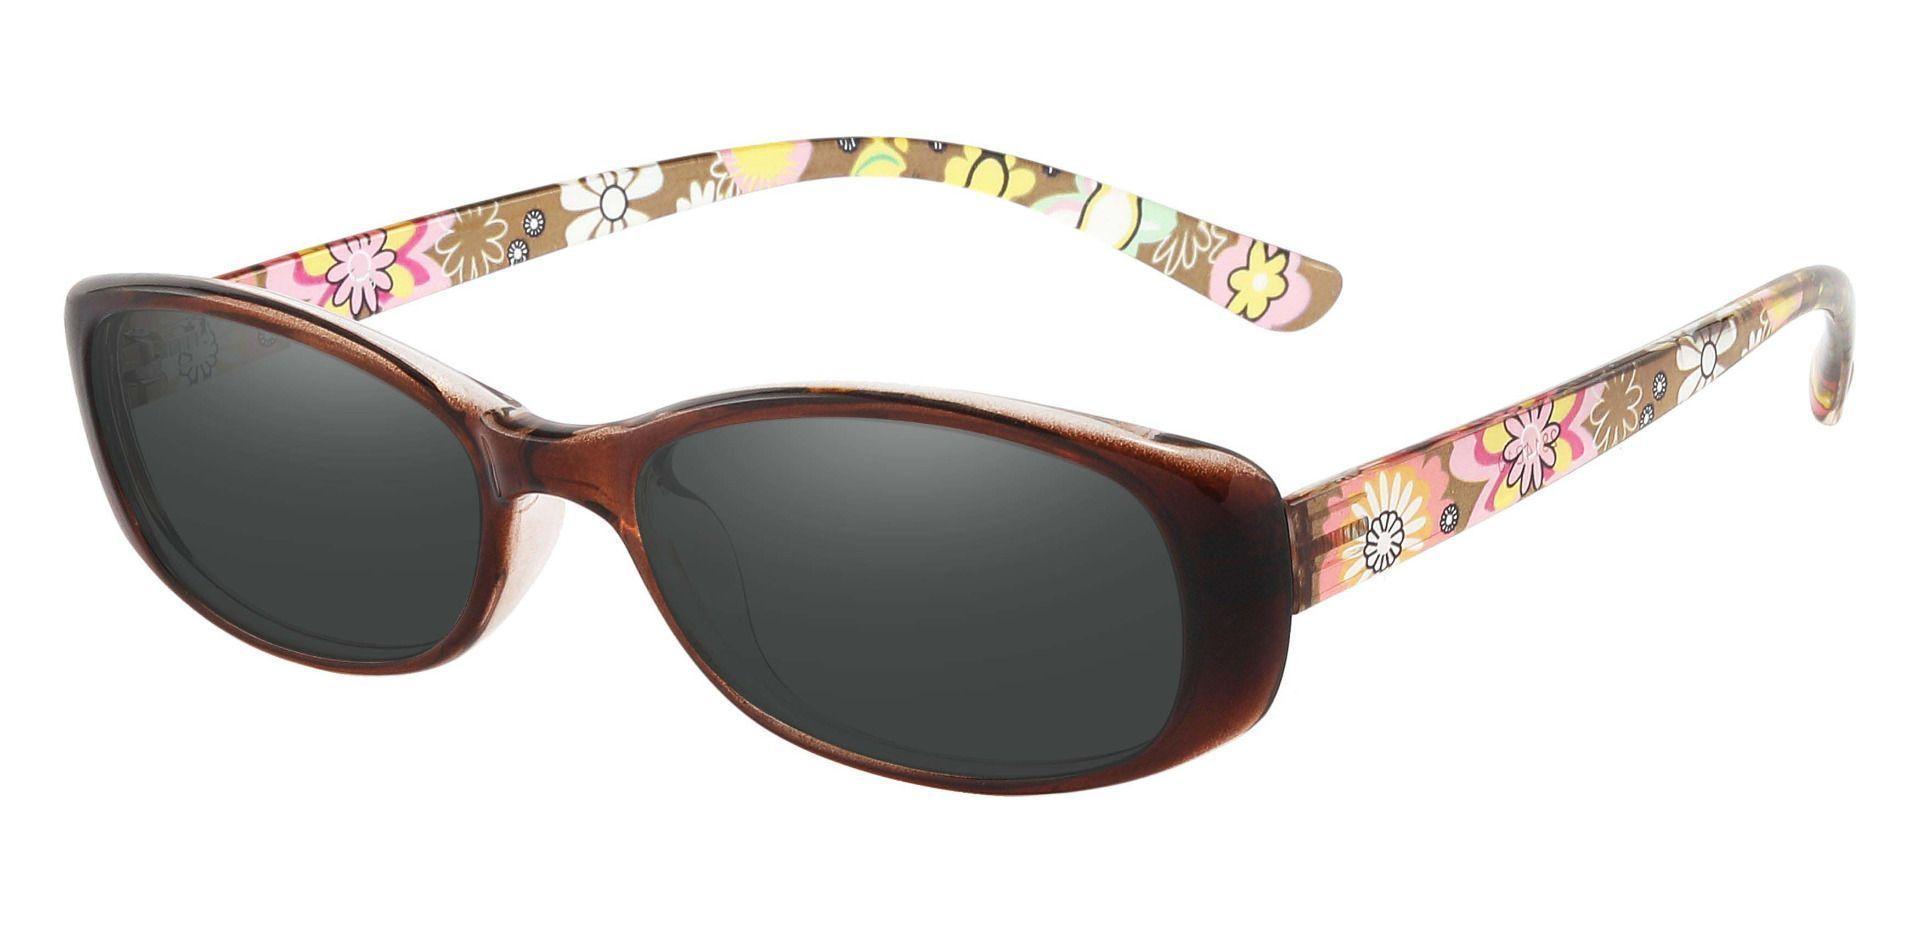 Bethesda Rectangle Prescription Sunglasses - Brown Frame With Gray Lenses